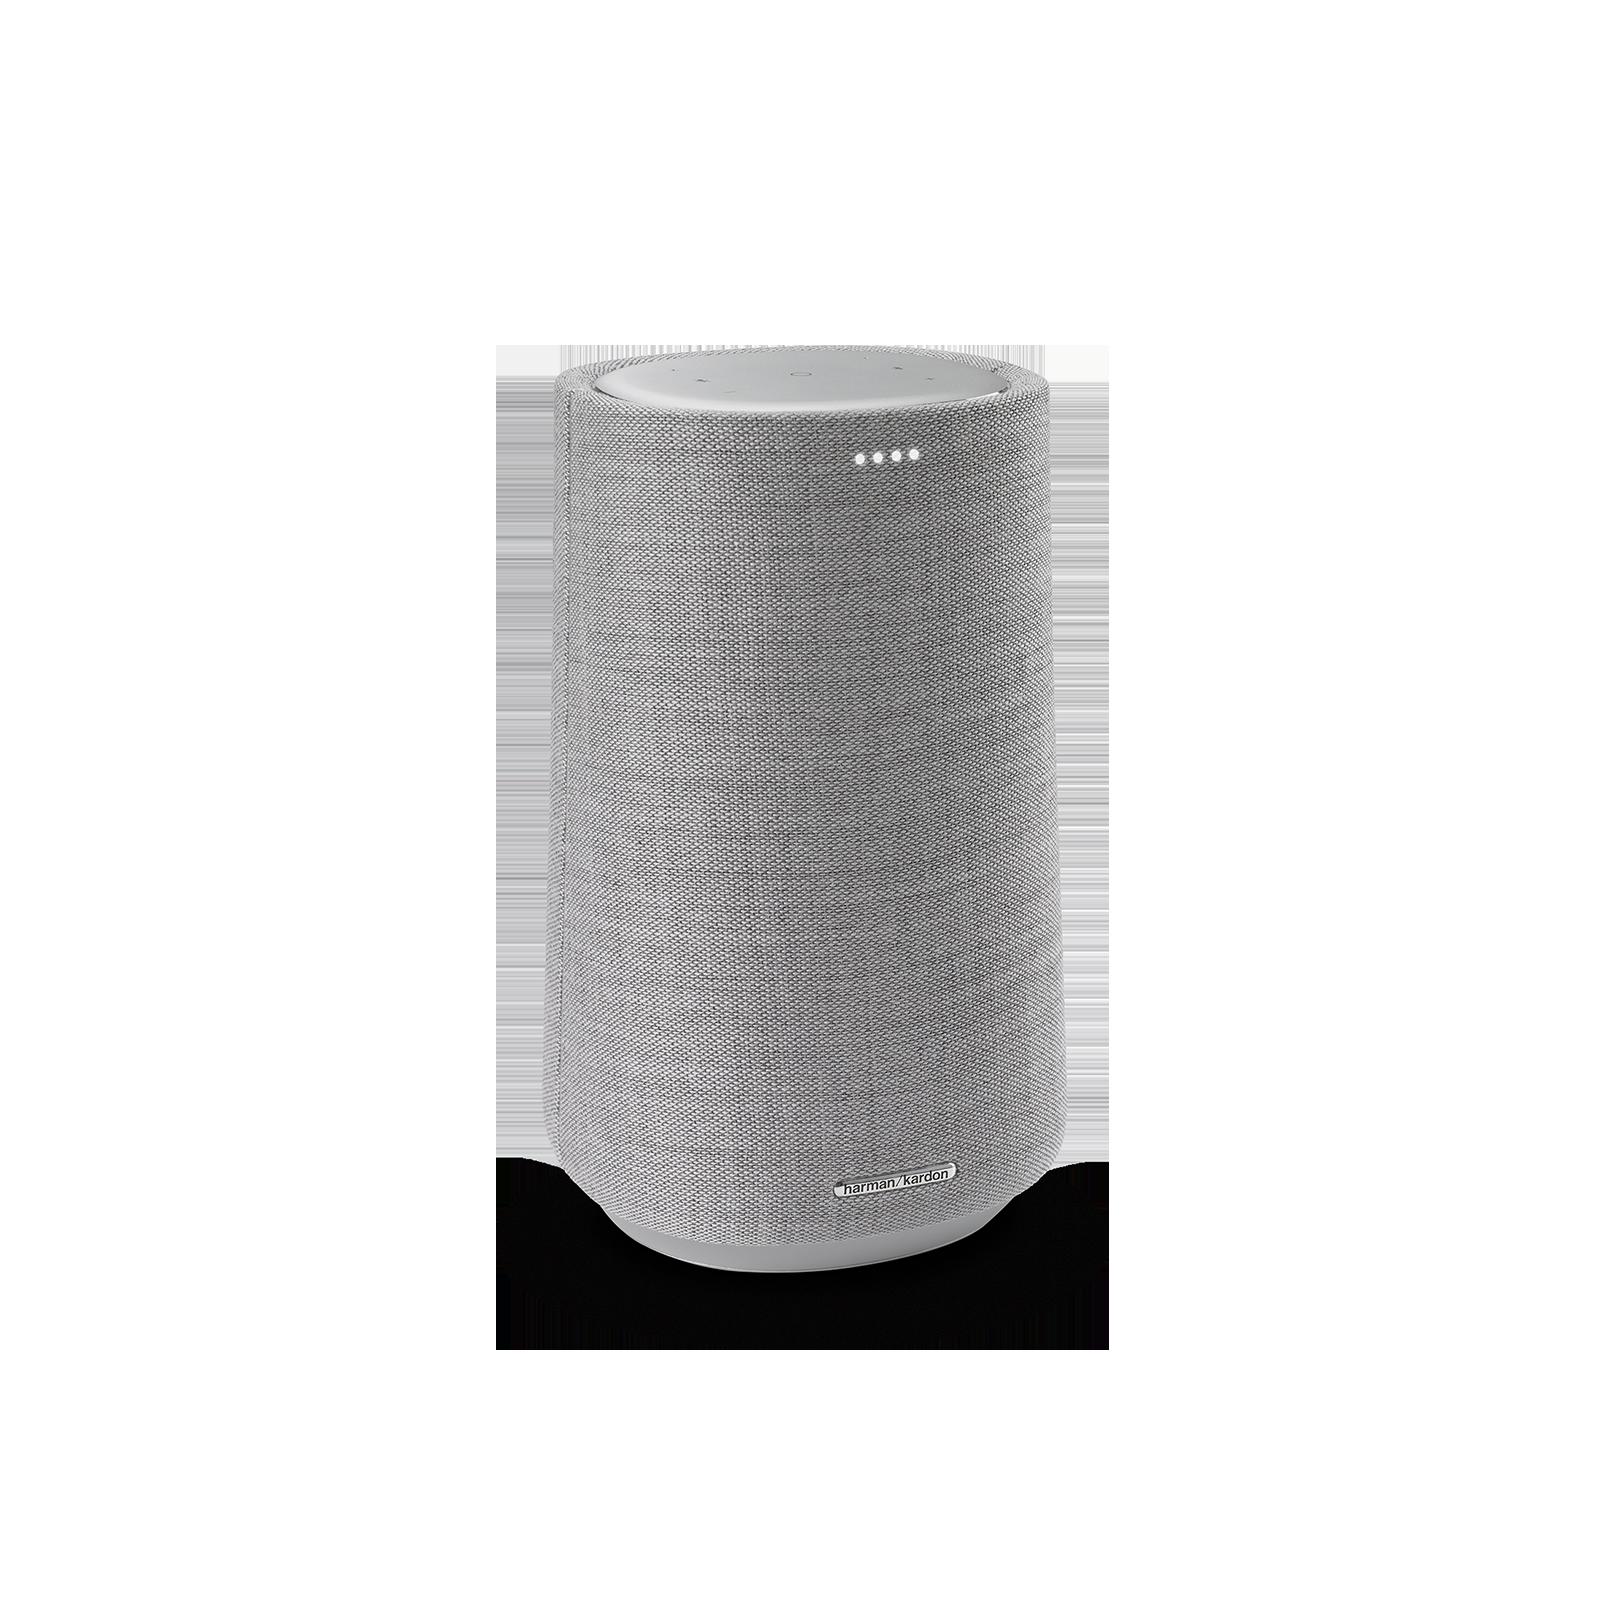 Harman Kardon Citation 100 - Grey - The smallest, smartest home speaker with impactful sound - Hero